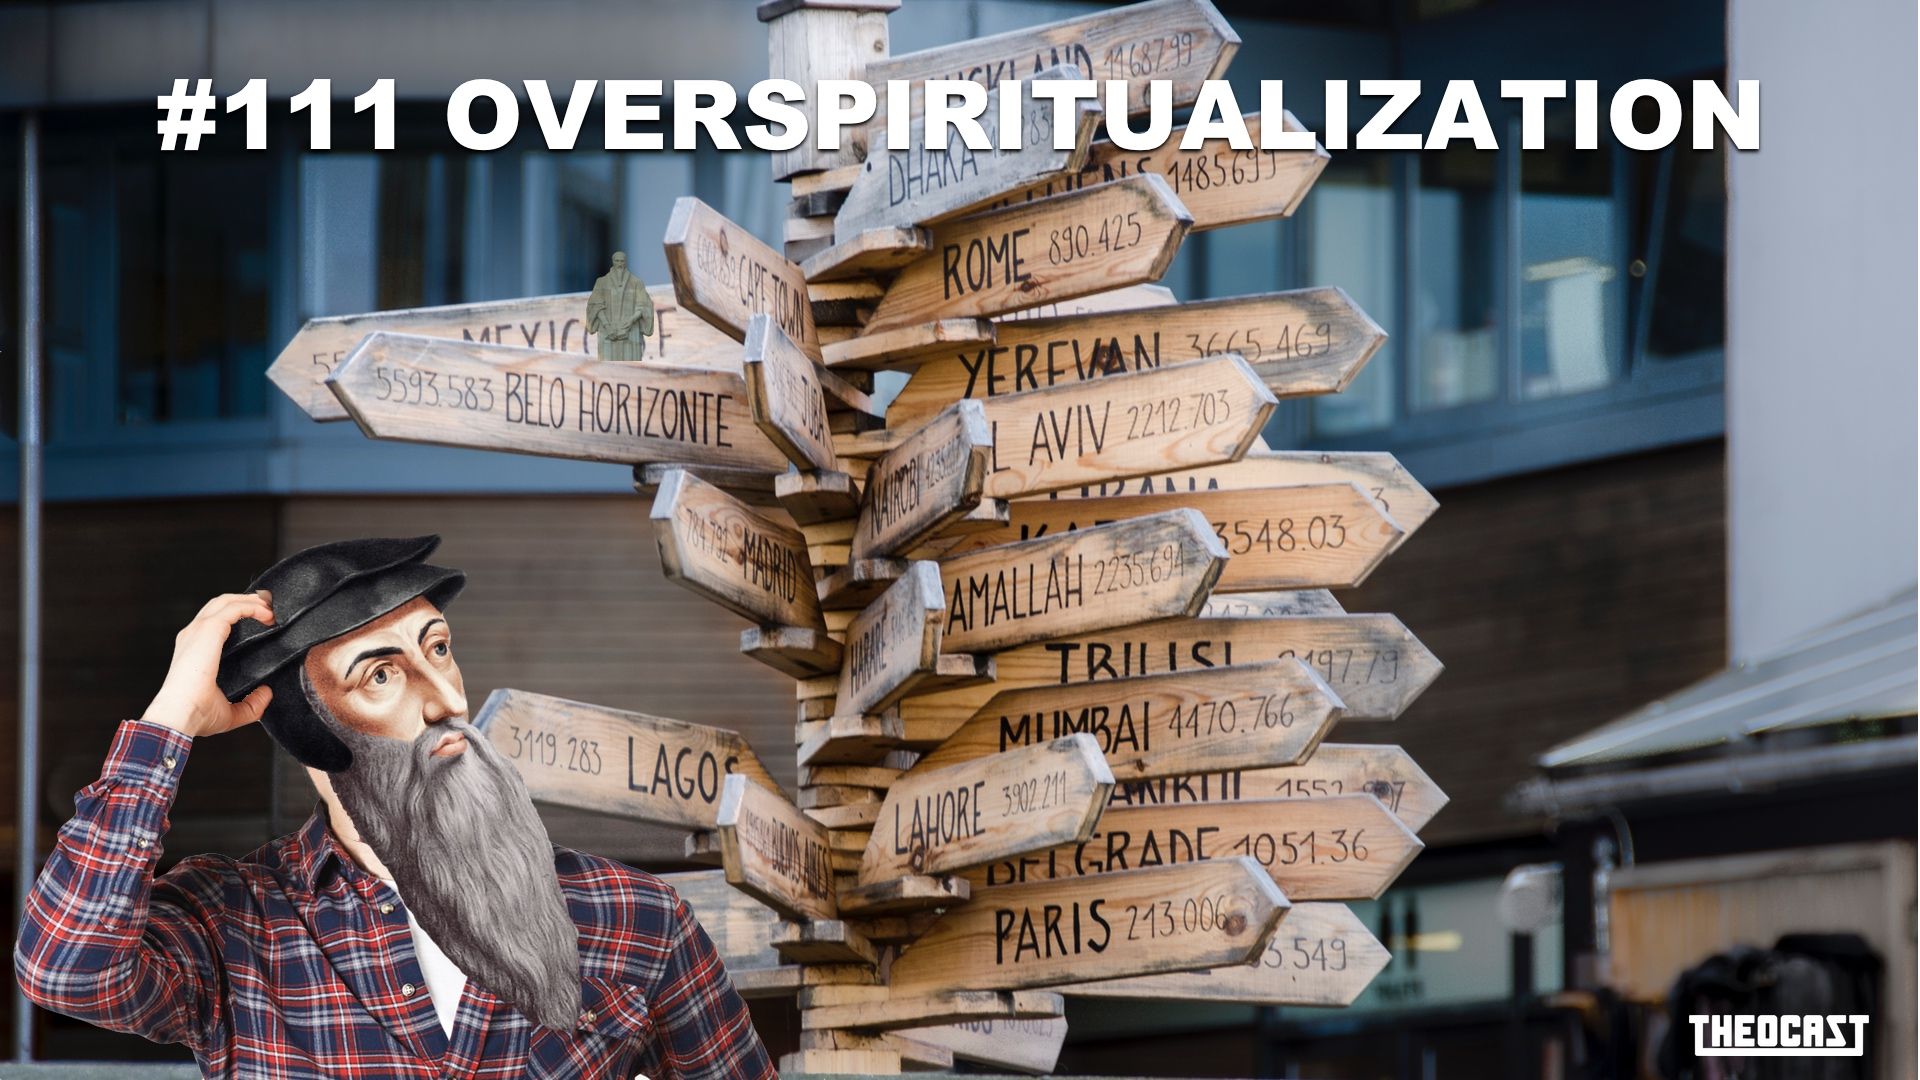 #111 Overspiritualization